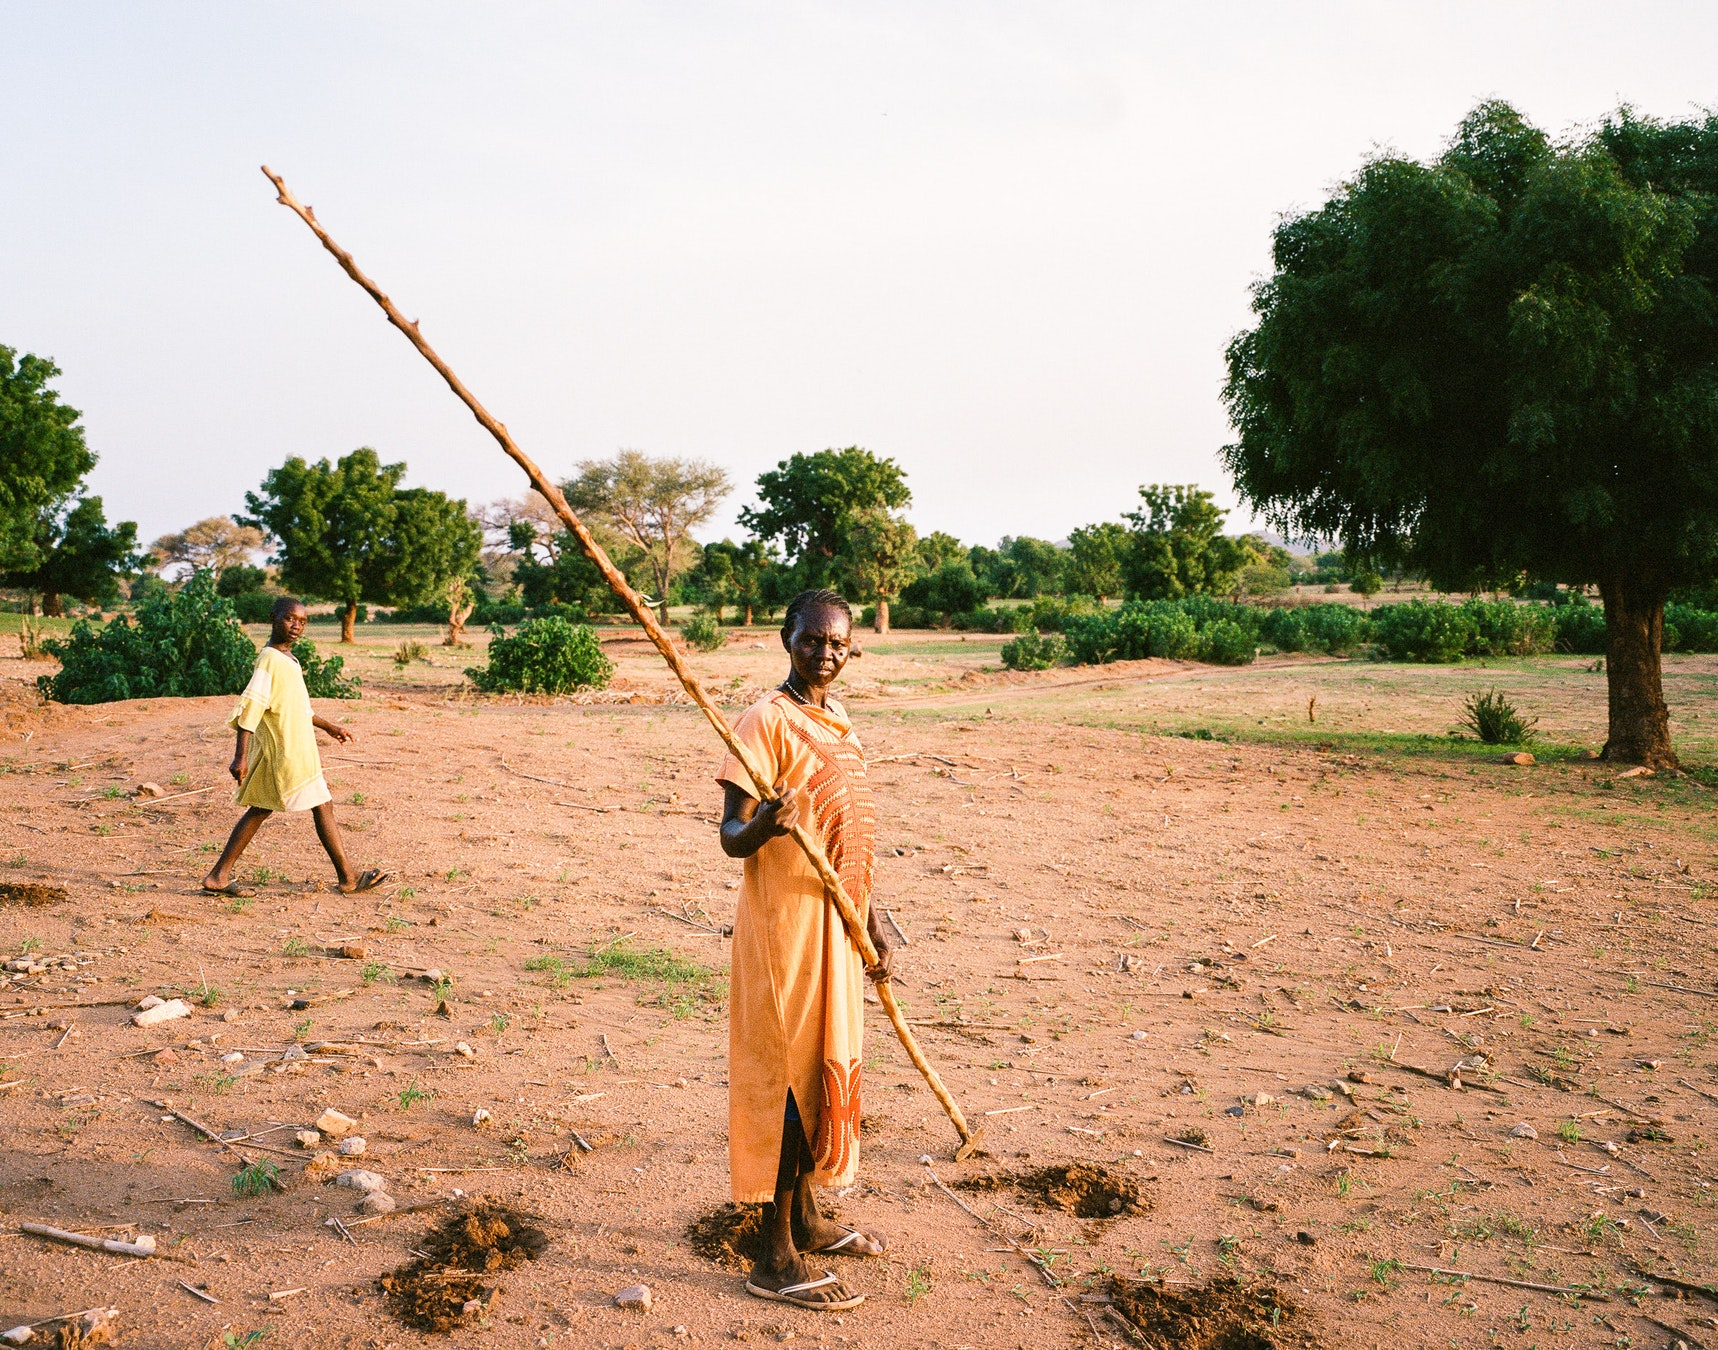 180600_PPF_SUDAN_BobMiller_12_02